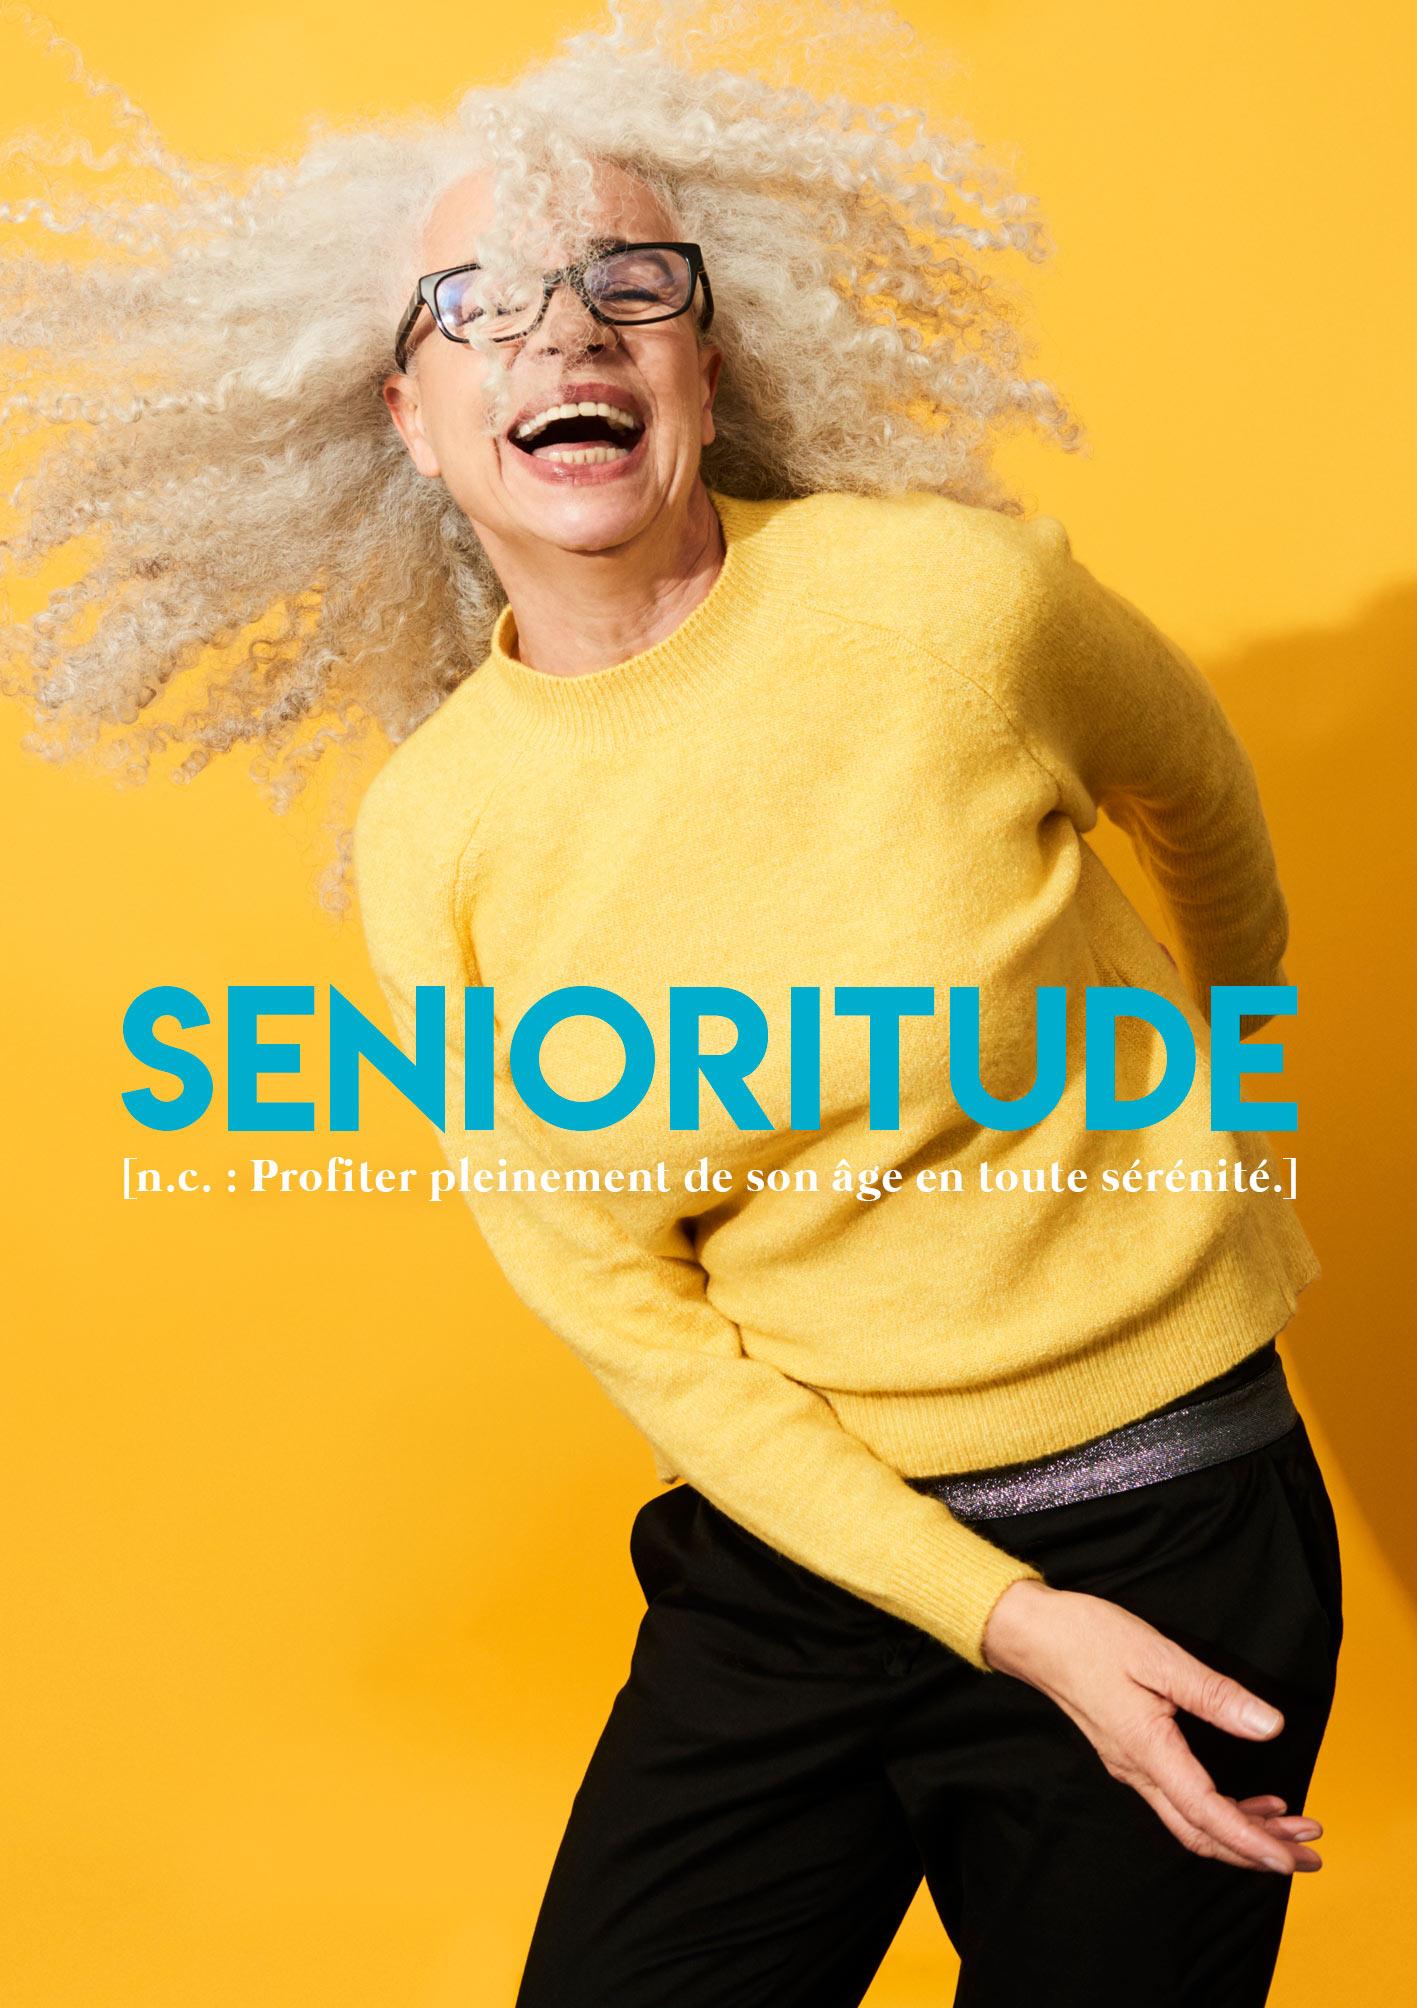 Senioritude 1.jpg